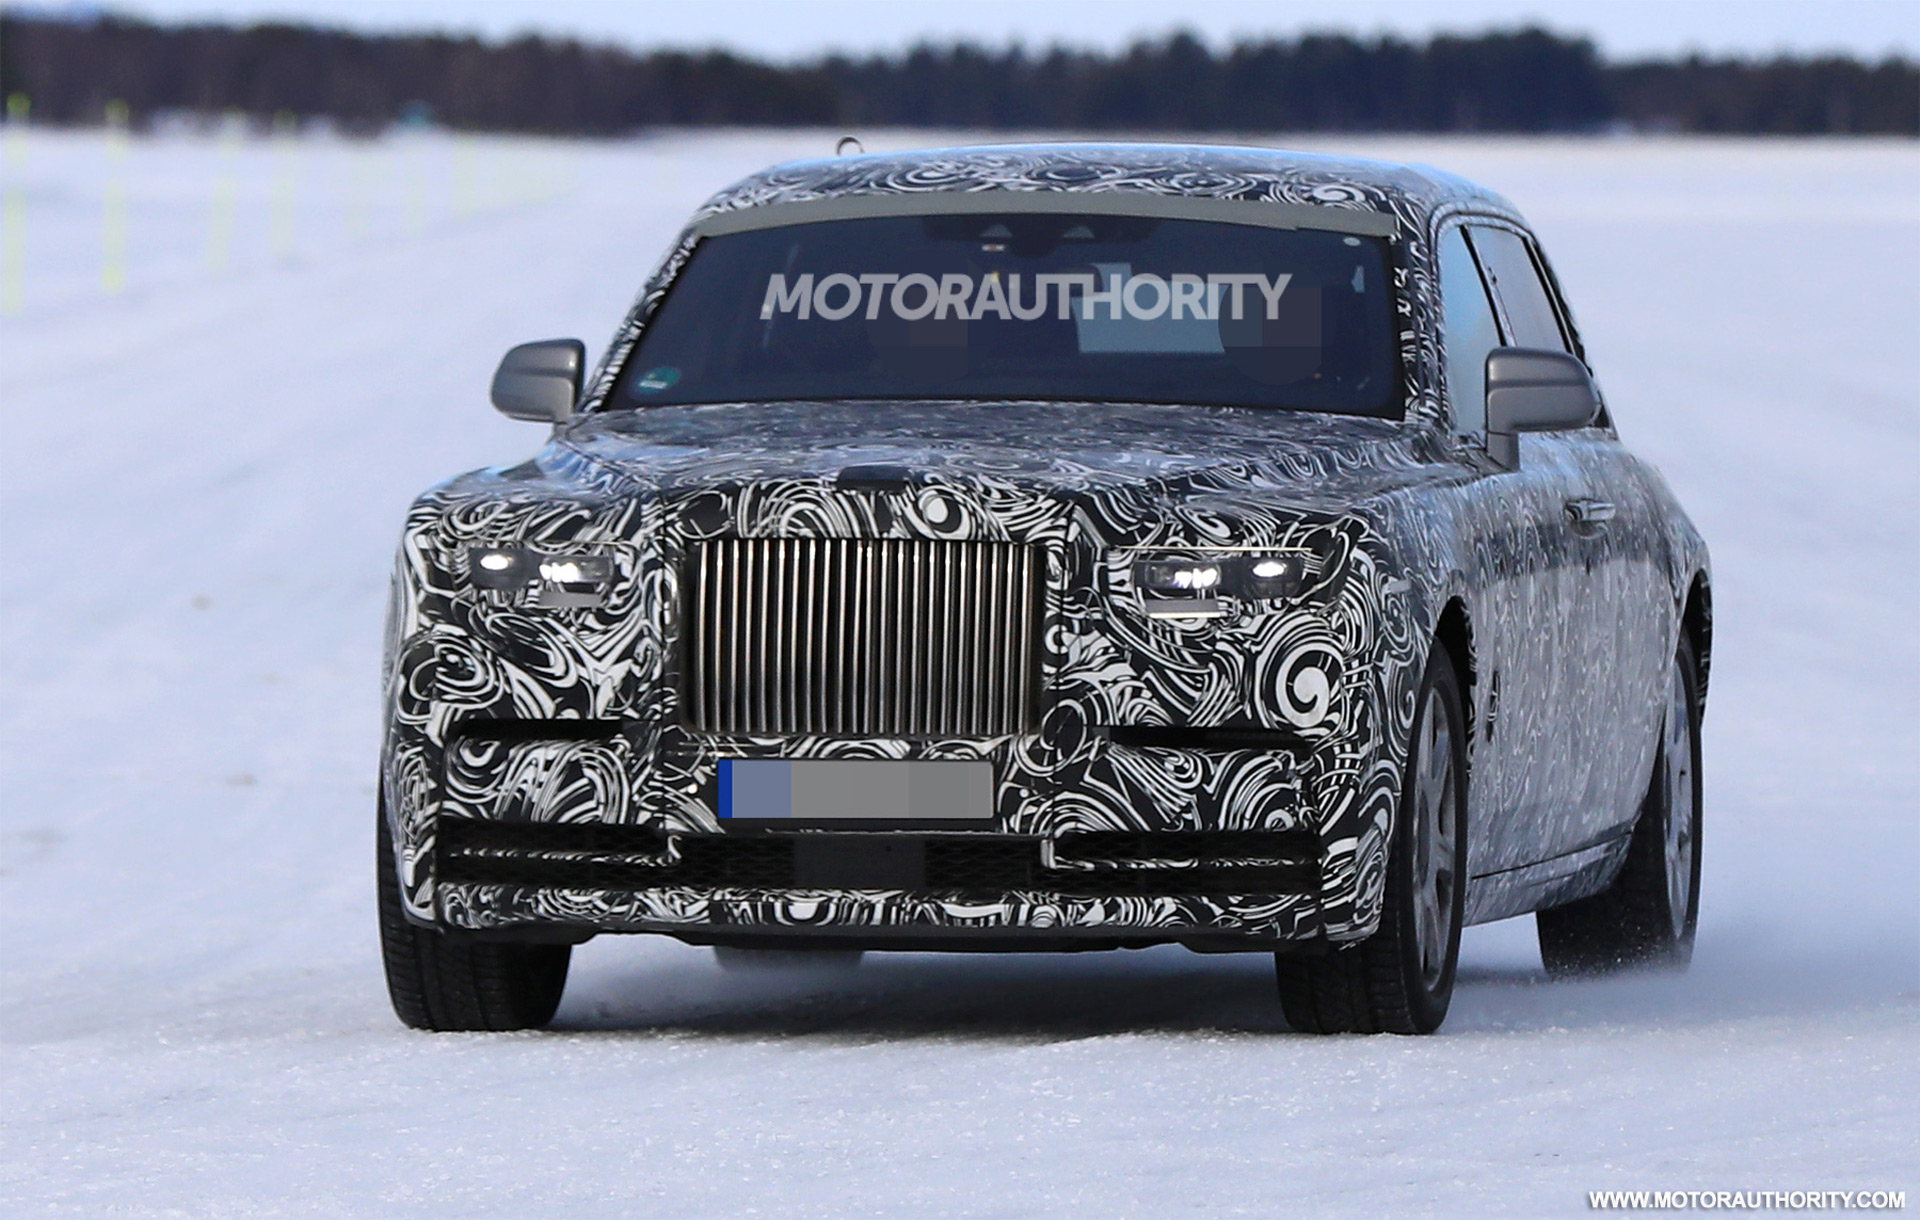 Rolls Royce to unveil new Phantom in July